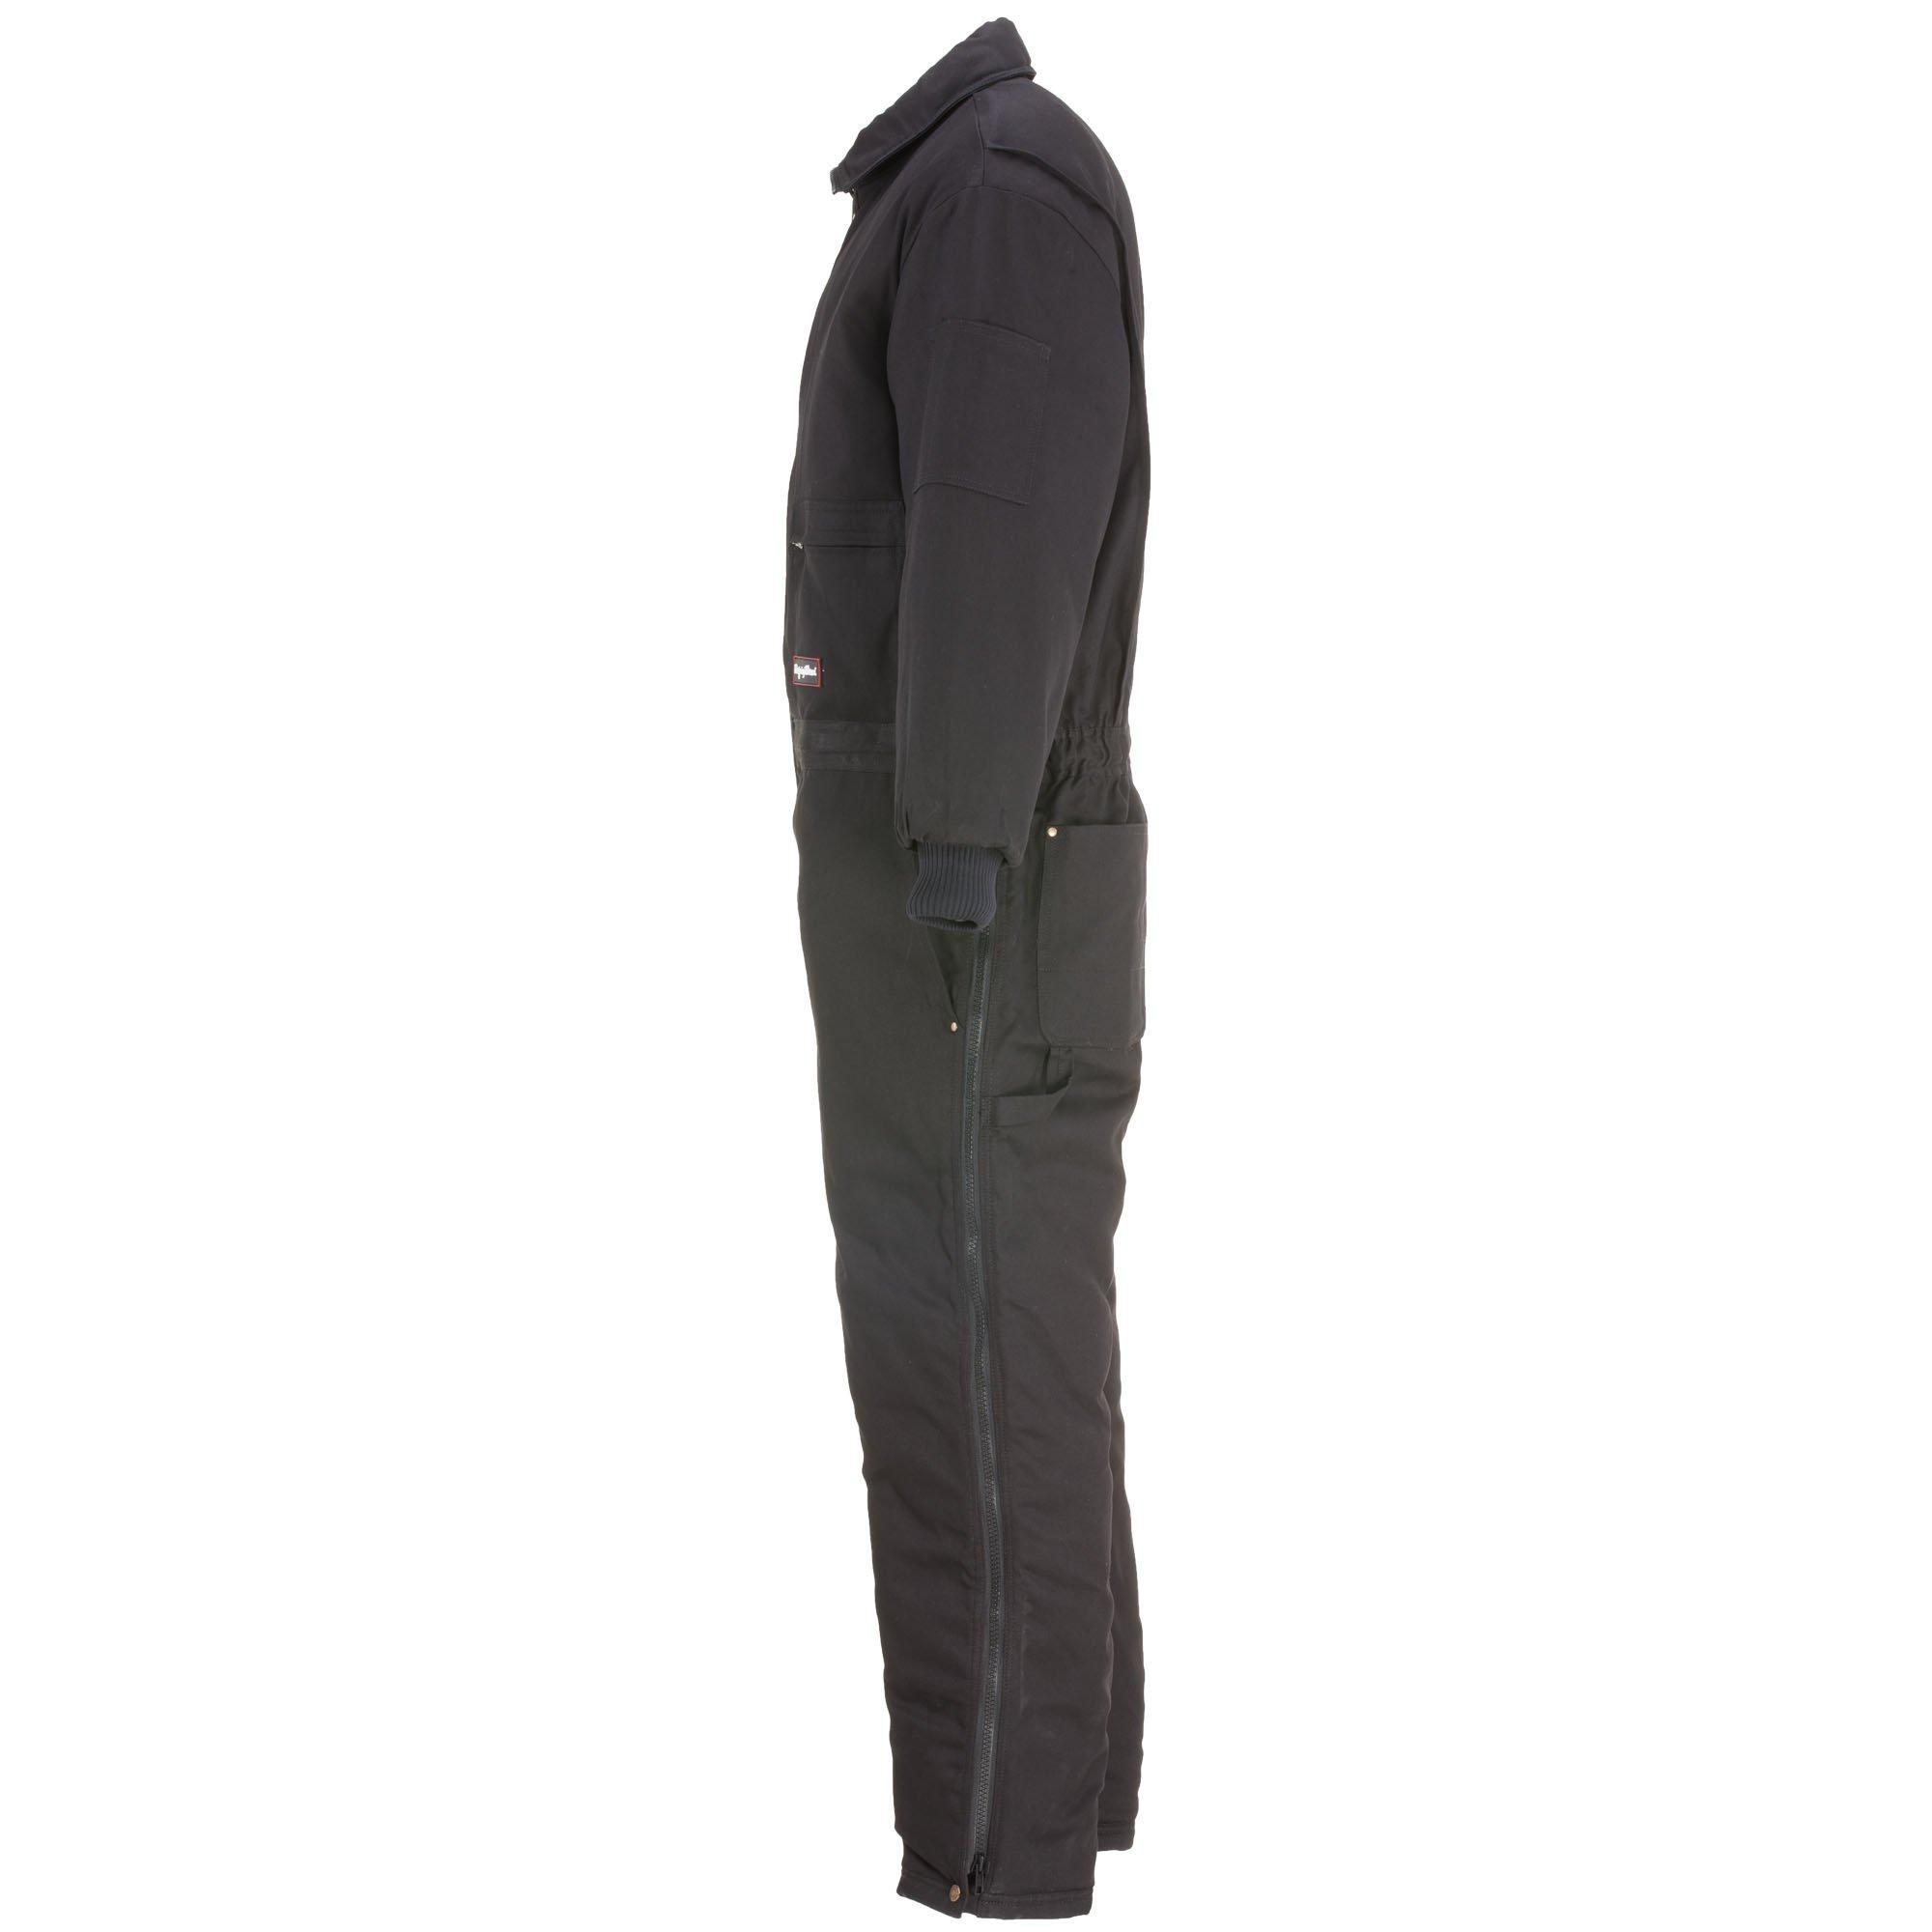 RefrigiWear Men's Water-Resistant Insulated Denim Comfortguard Coveralls (Black, XL) by RefrigiWear (Image #3)